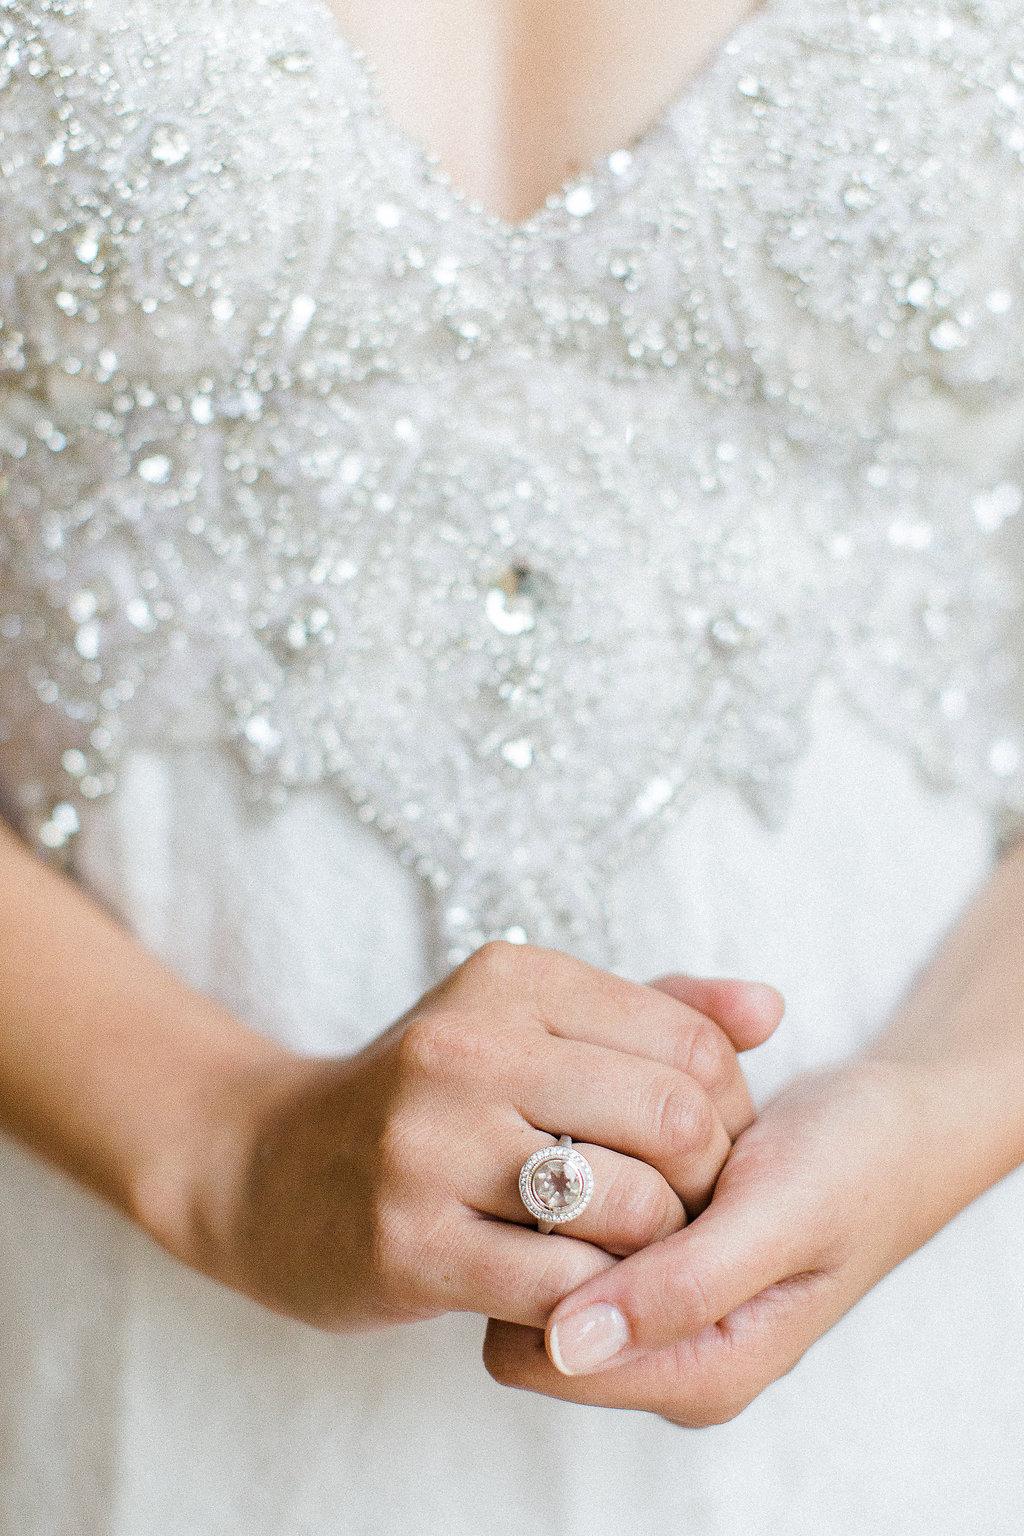 Verona-Destination-Wedding-Inspiration-by-Kibogo-Photography7.jpg